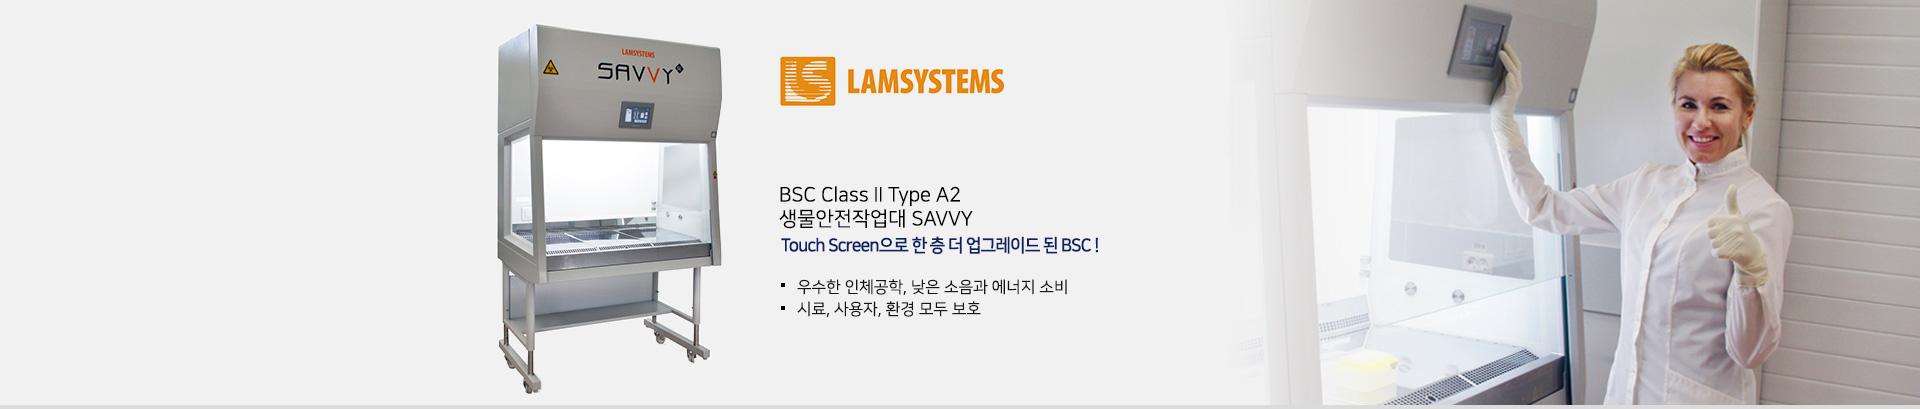 201902_main_lamsystems2